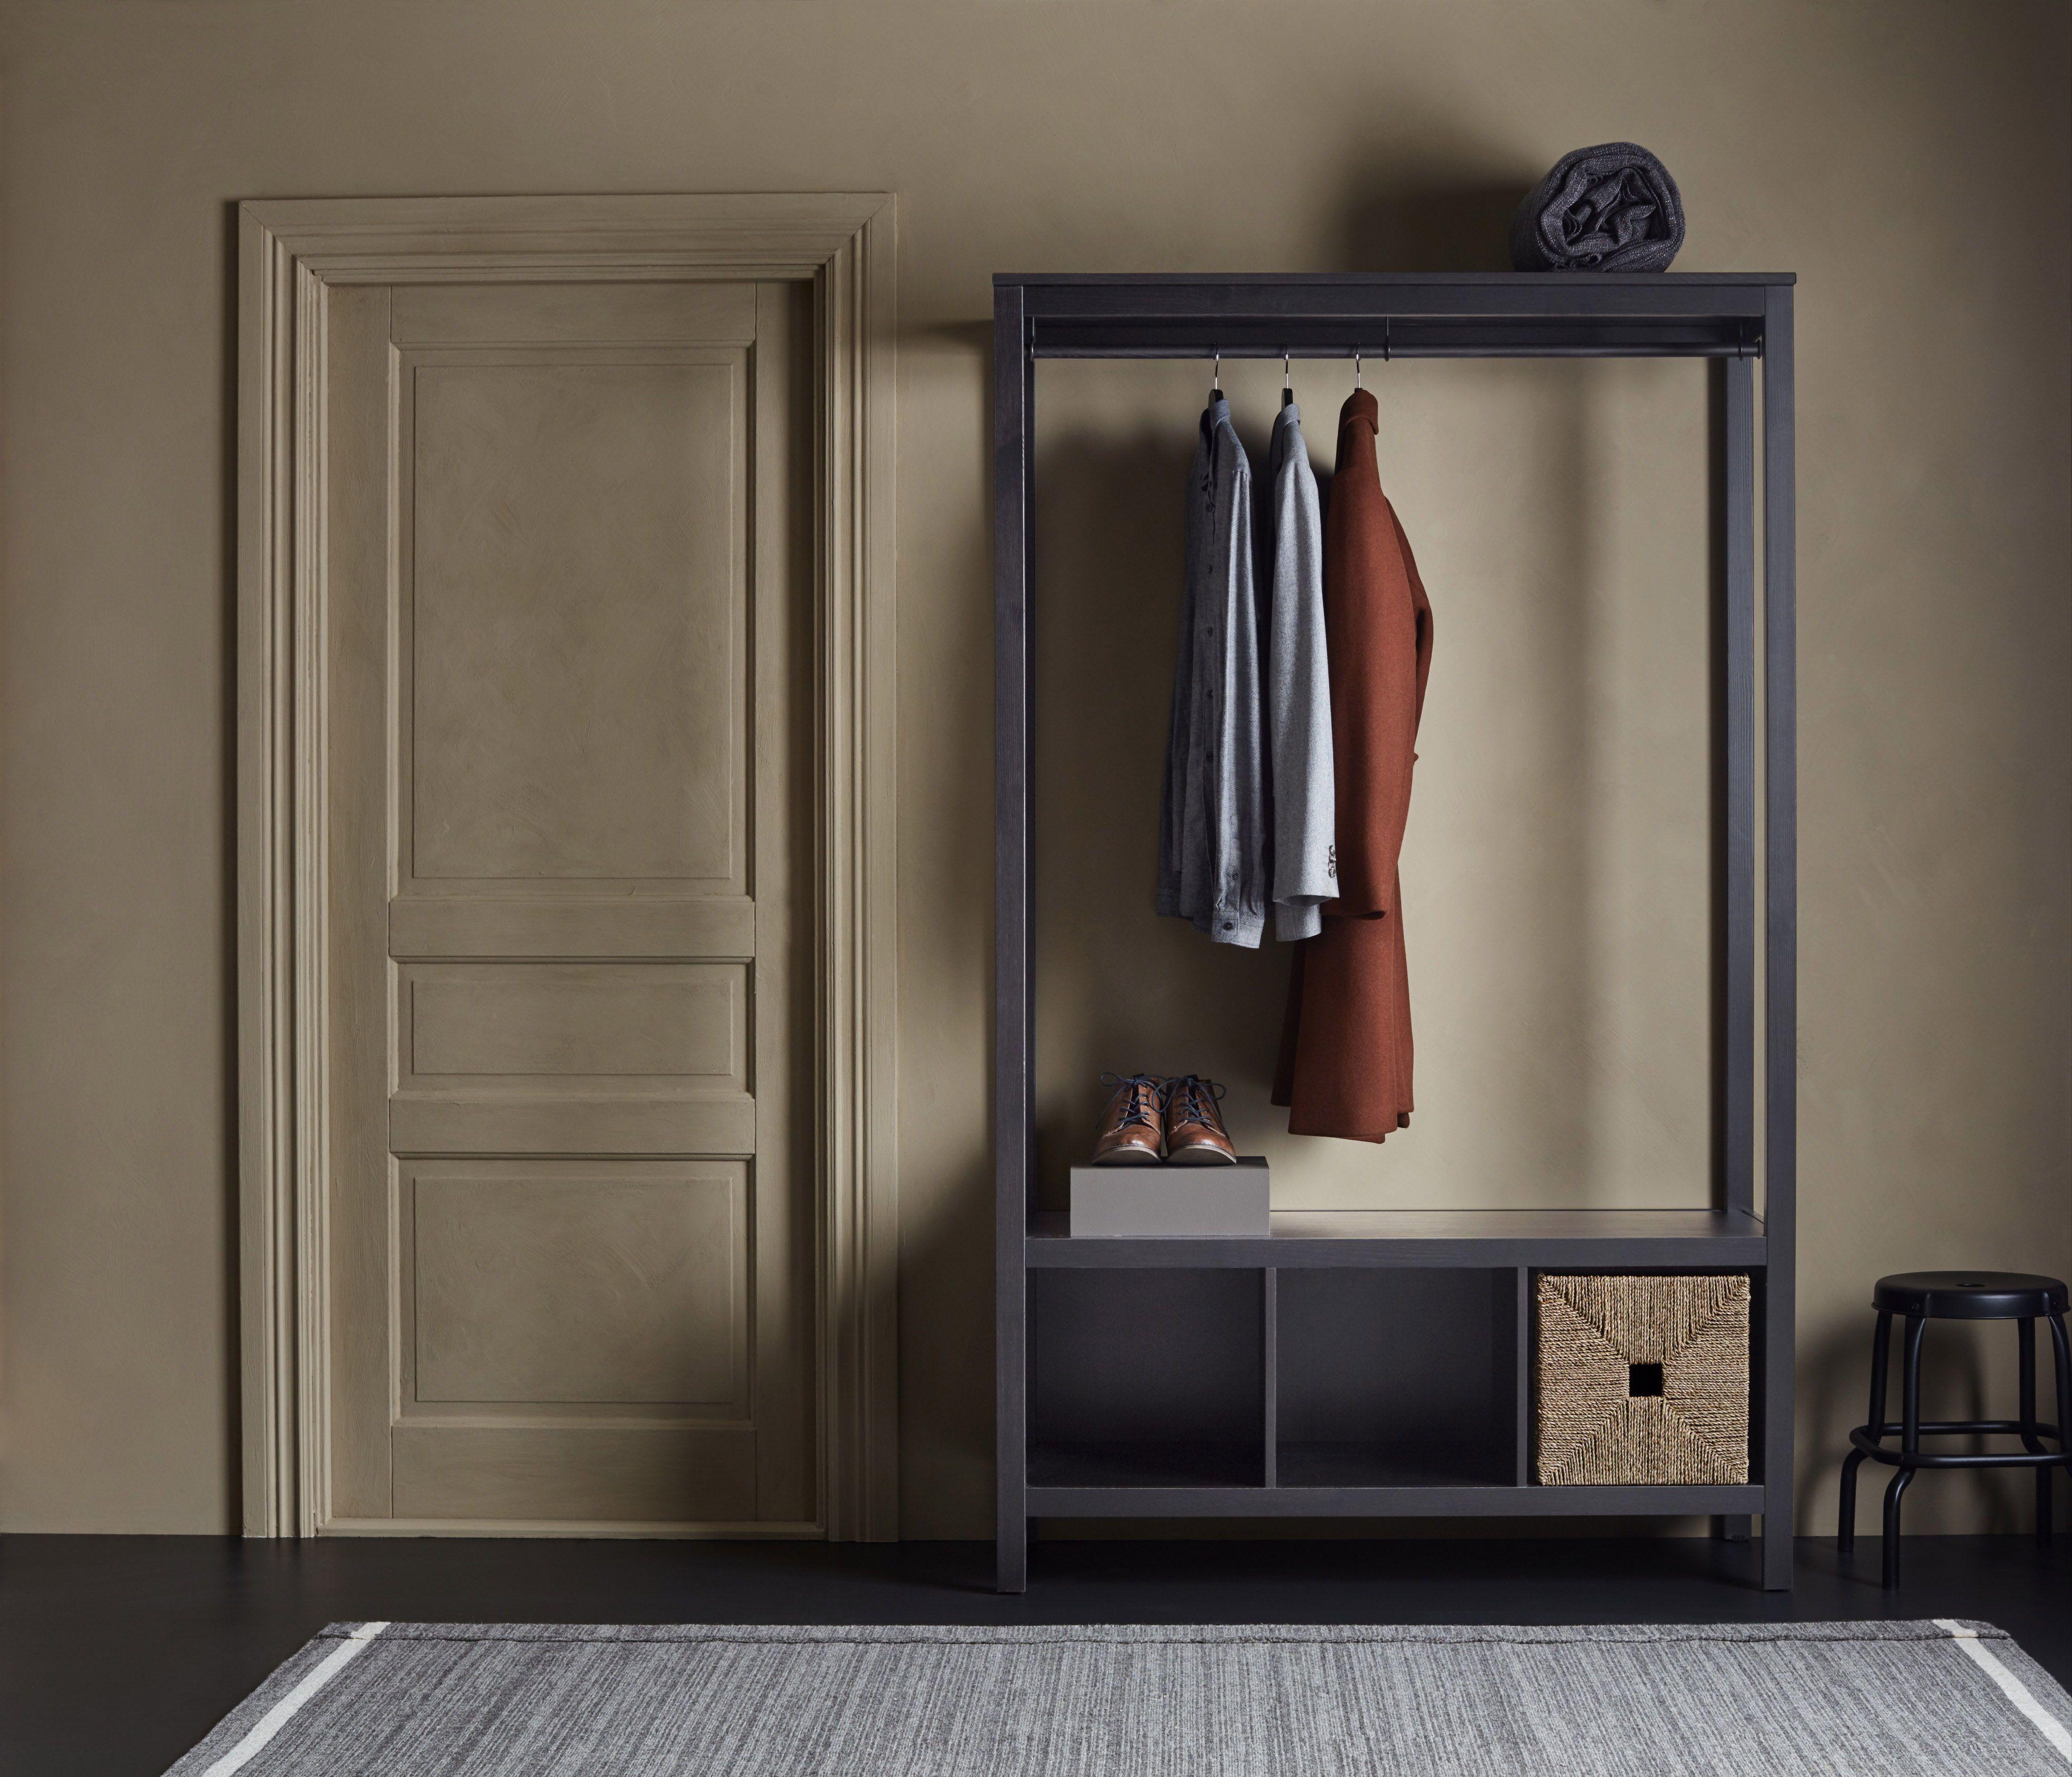 Ikea Hemnes Linnenkast.Hemnes Open Kledingkast Wit Gelazuurd Ikea Catalogus